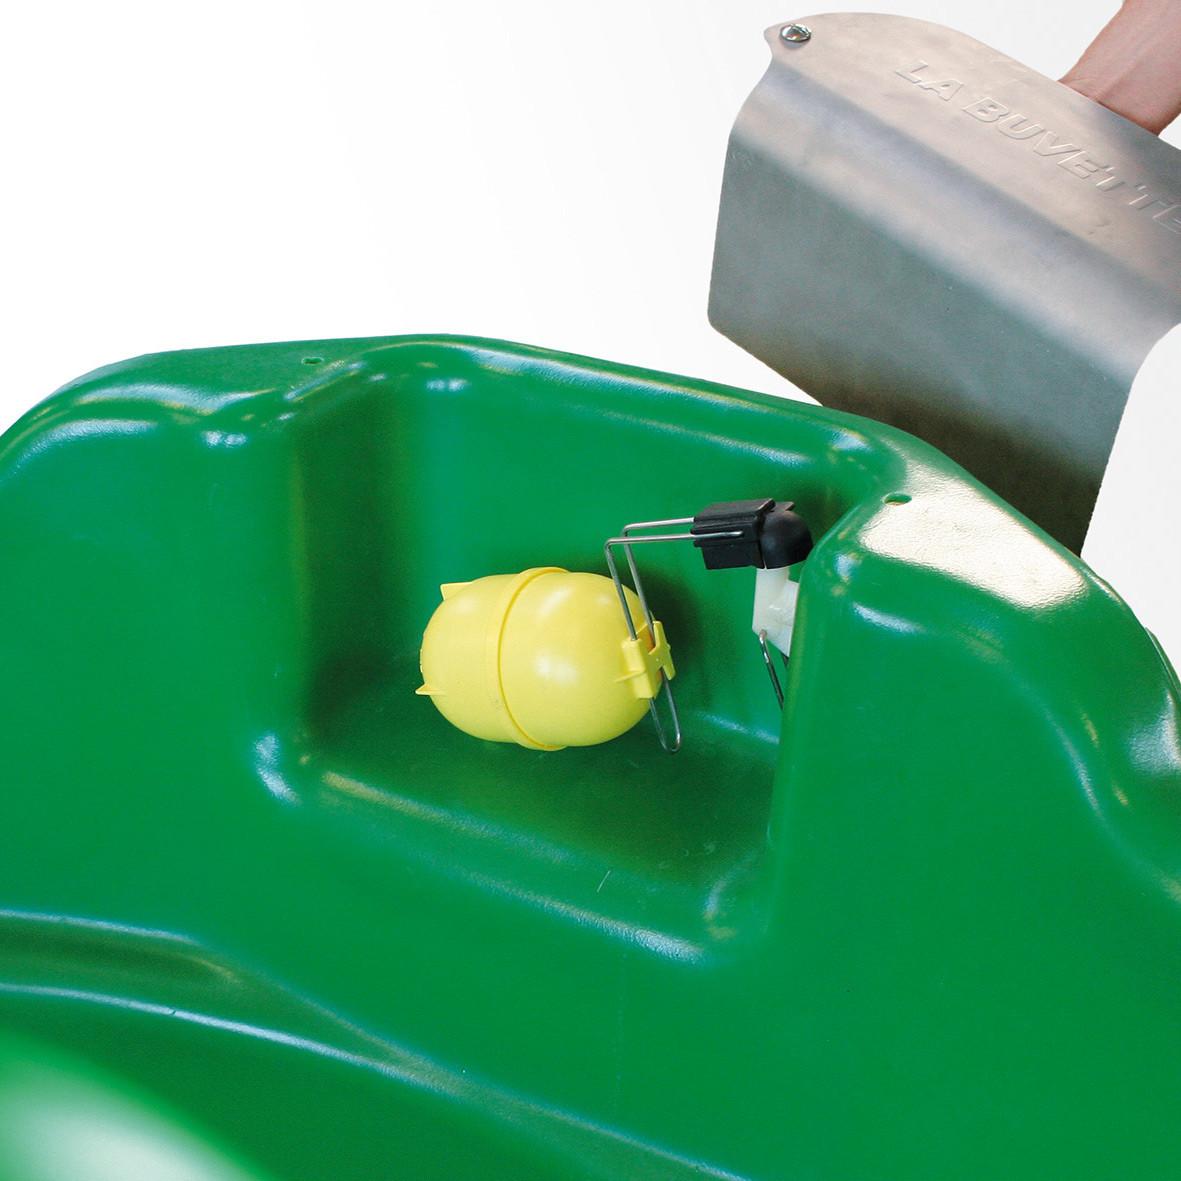 Kit robinetterie flotteur INTERBAC A623